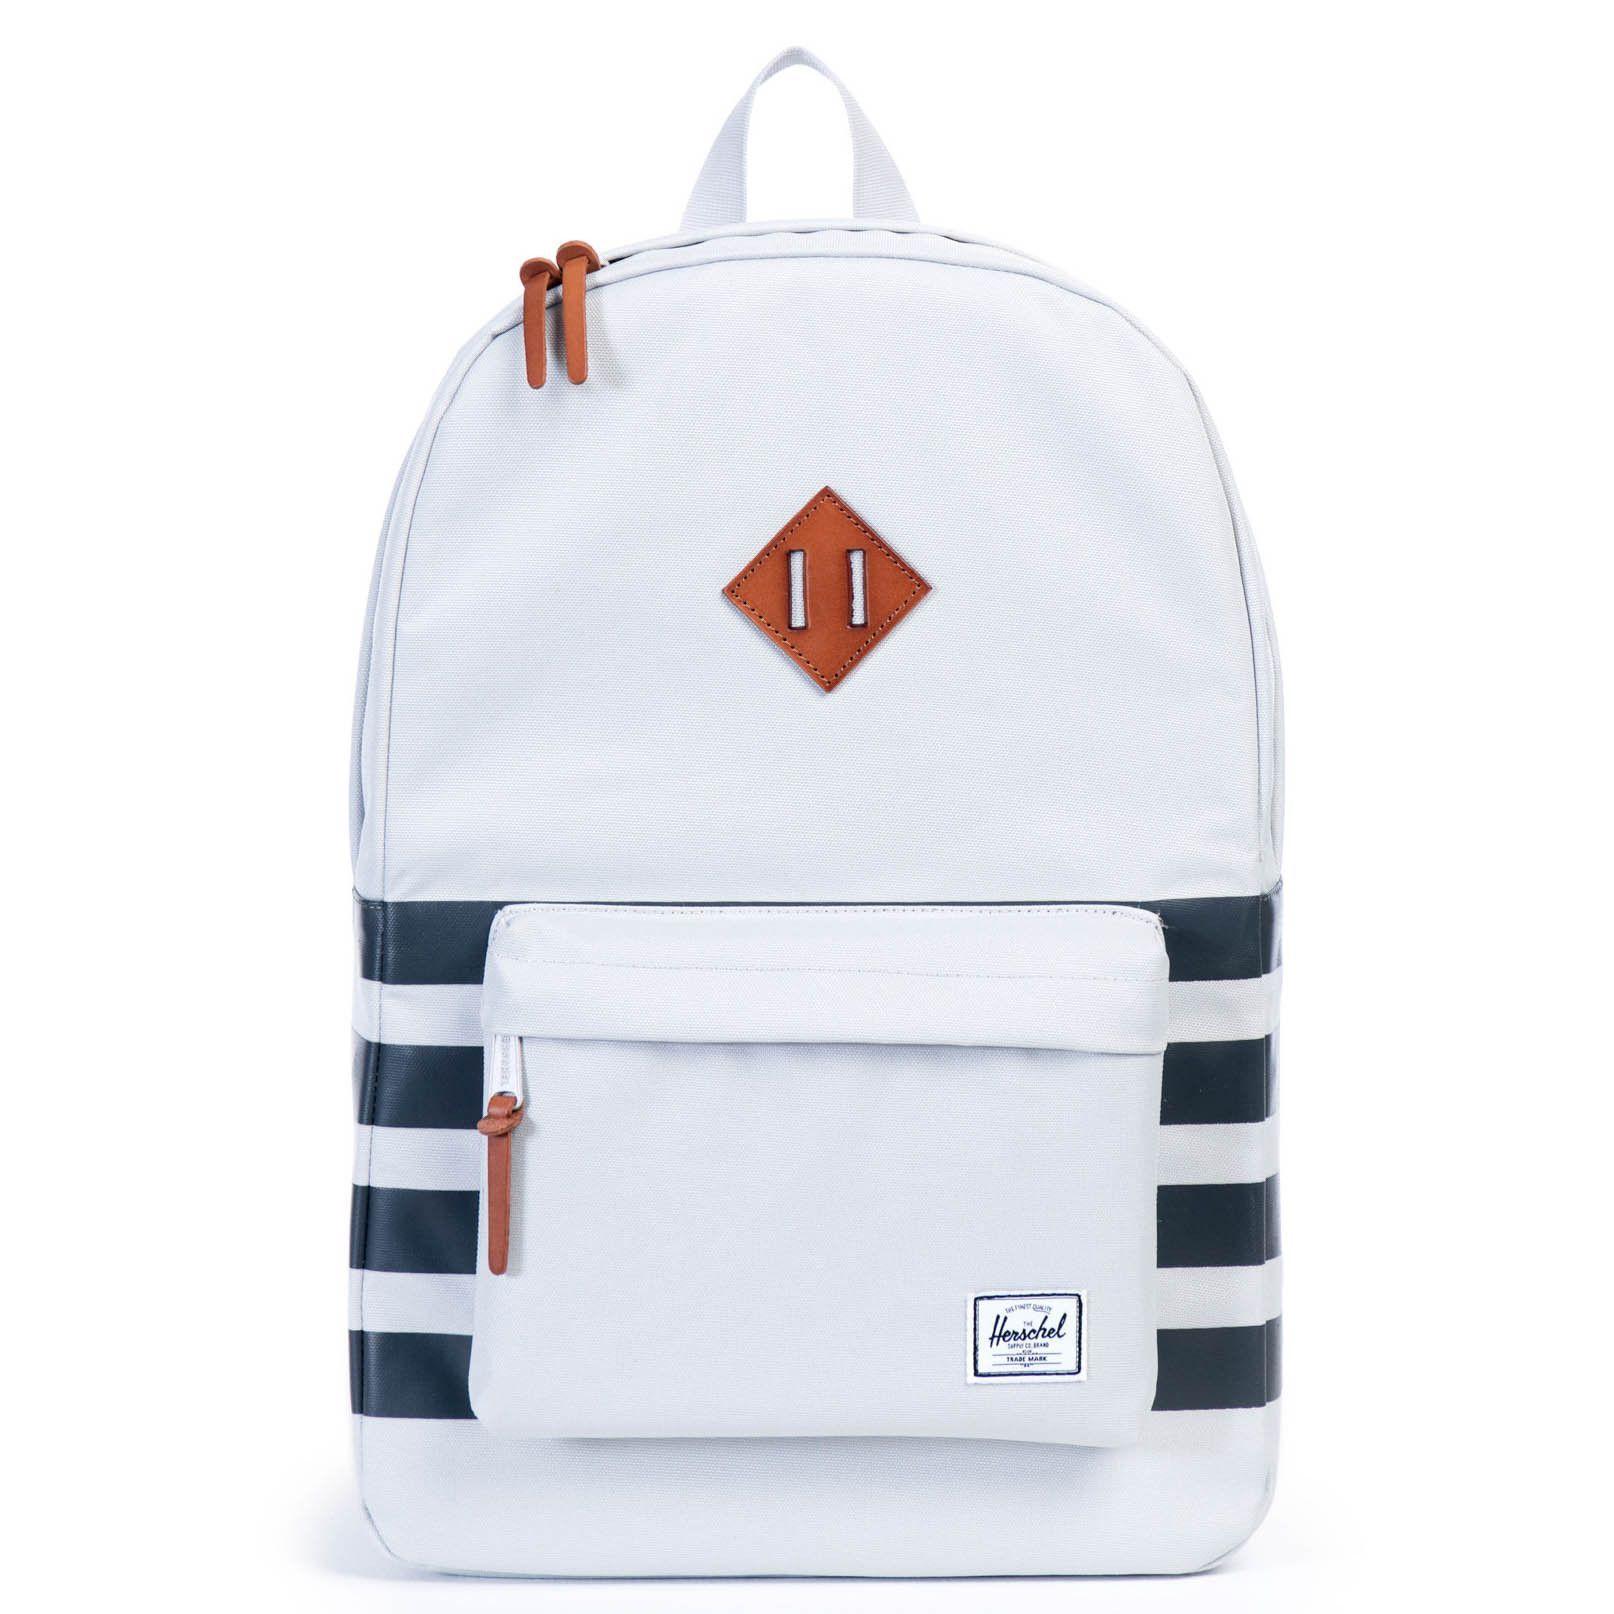 Herschel Supply Co. Offset Collection Heriatge Backpack - Lunar Rock - Low Price